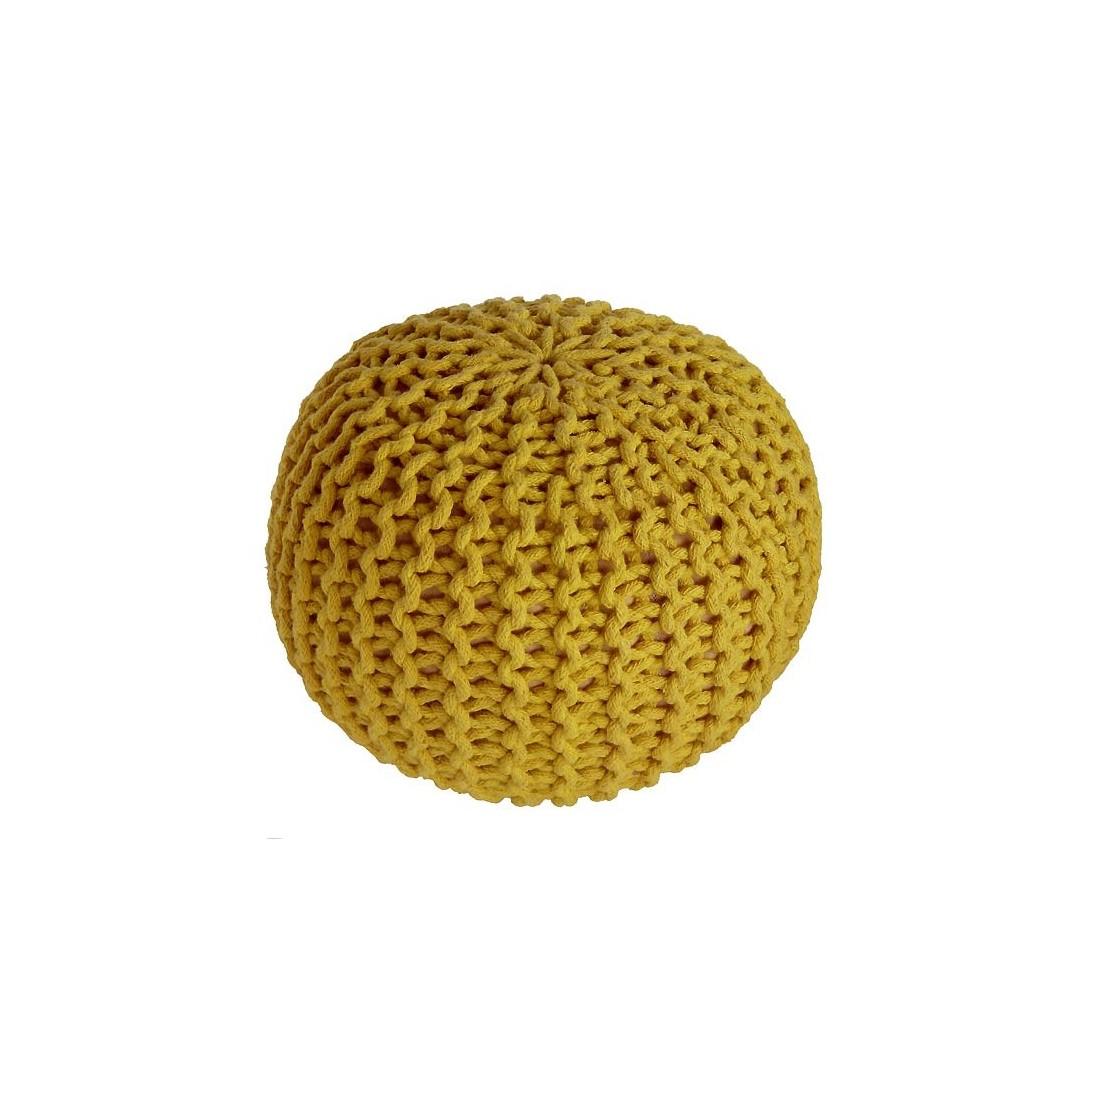 pouf enfant coton effet maille tricot lili jaune nattiot ma chambramoi. Black Bedroom Furniture Sets. Home Design Ideas